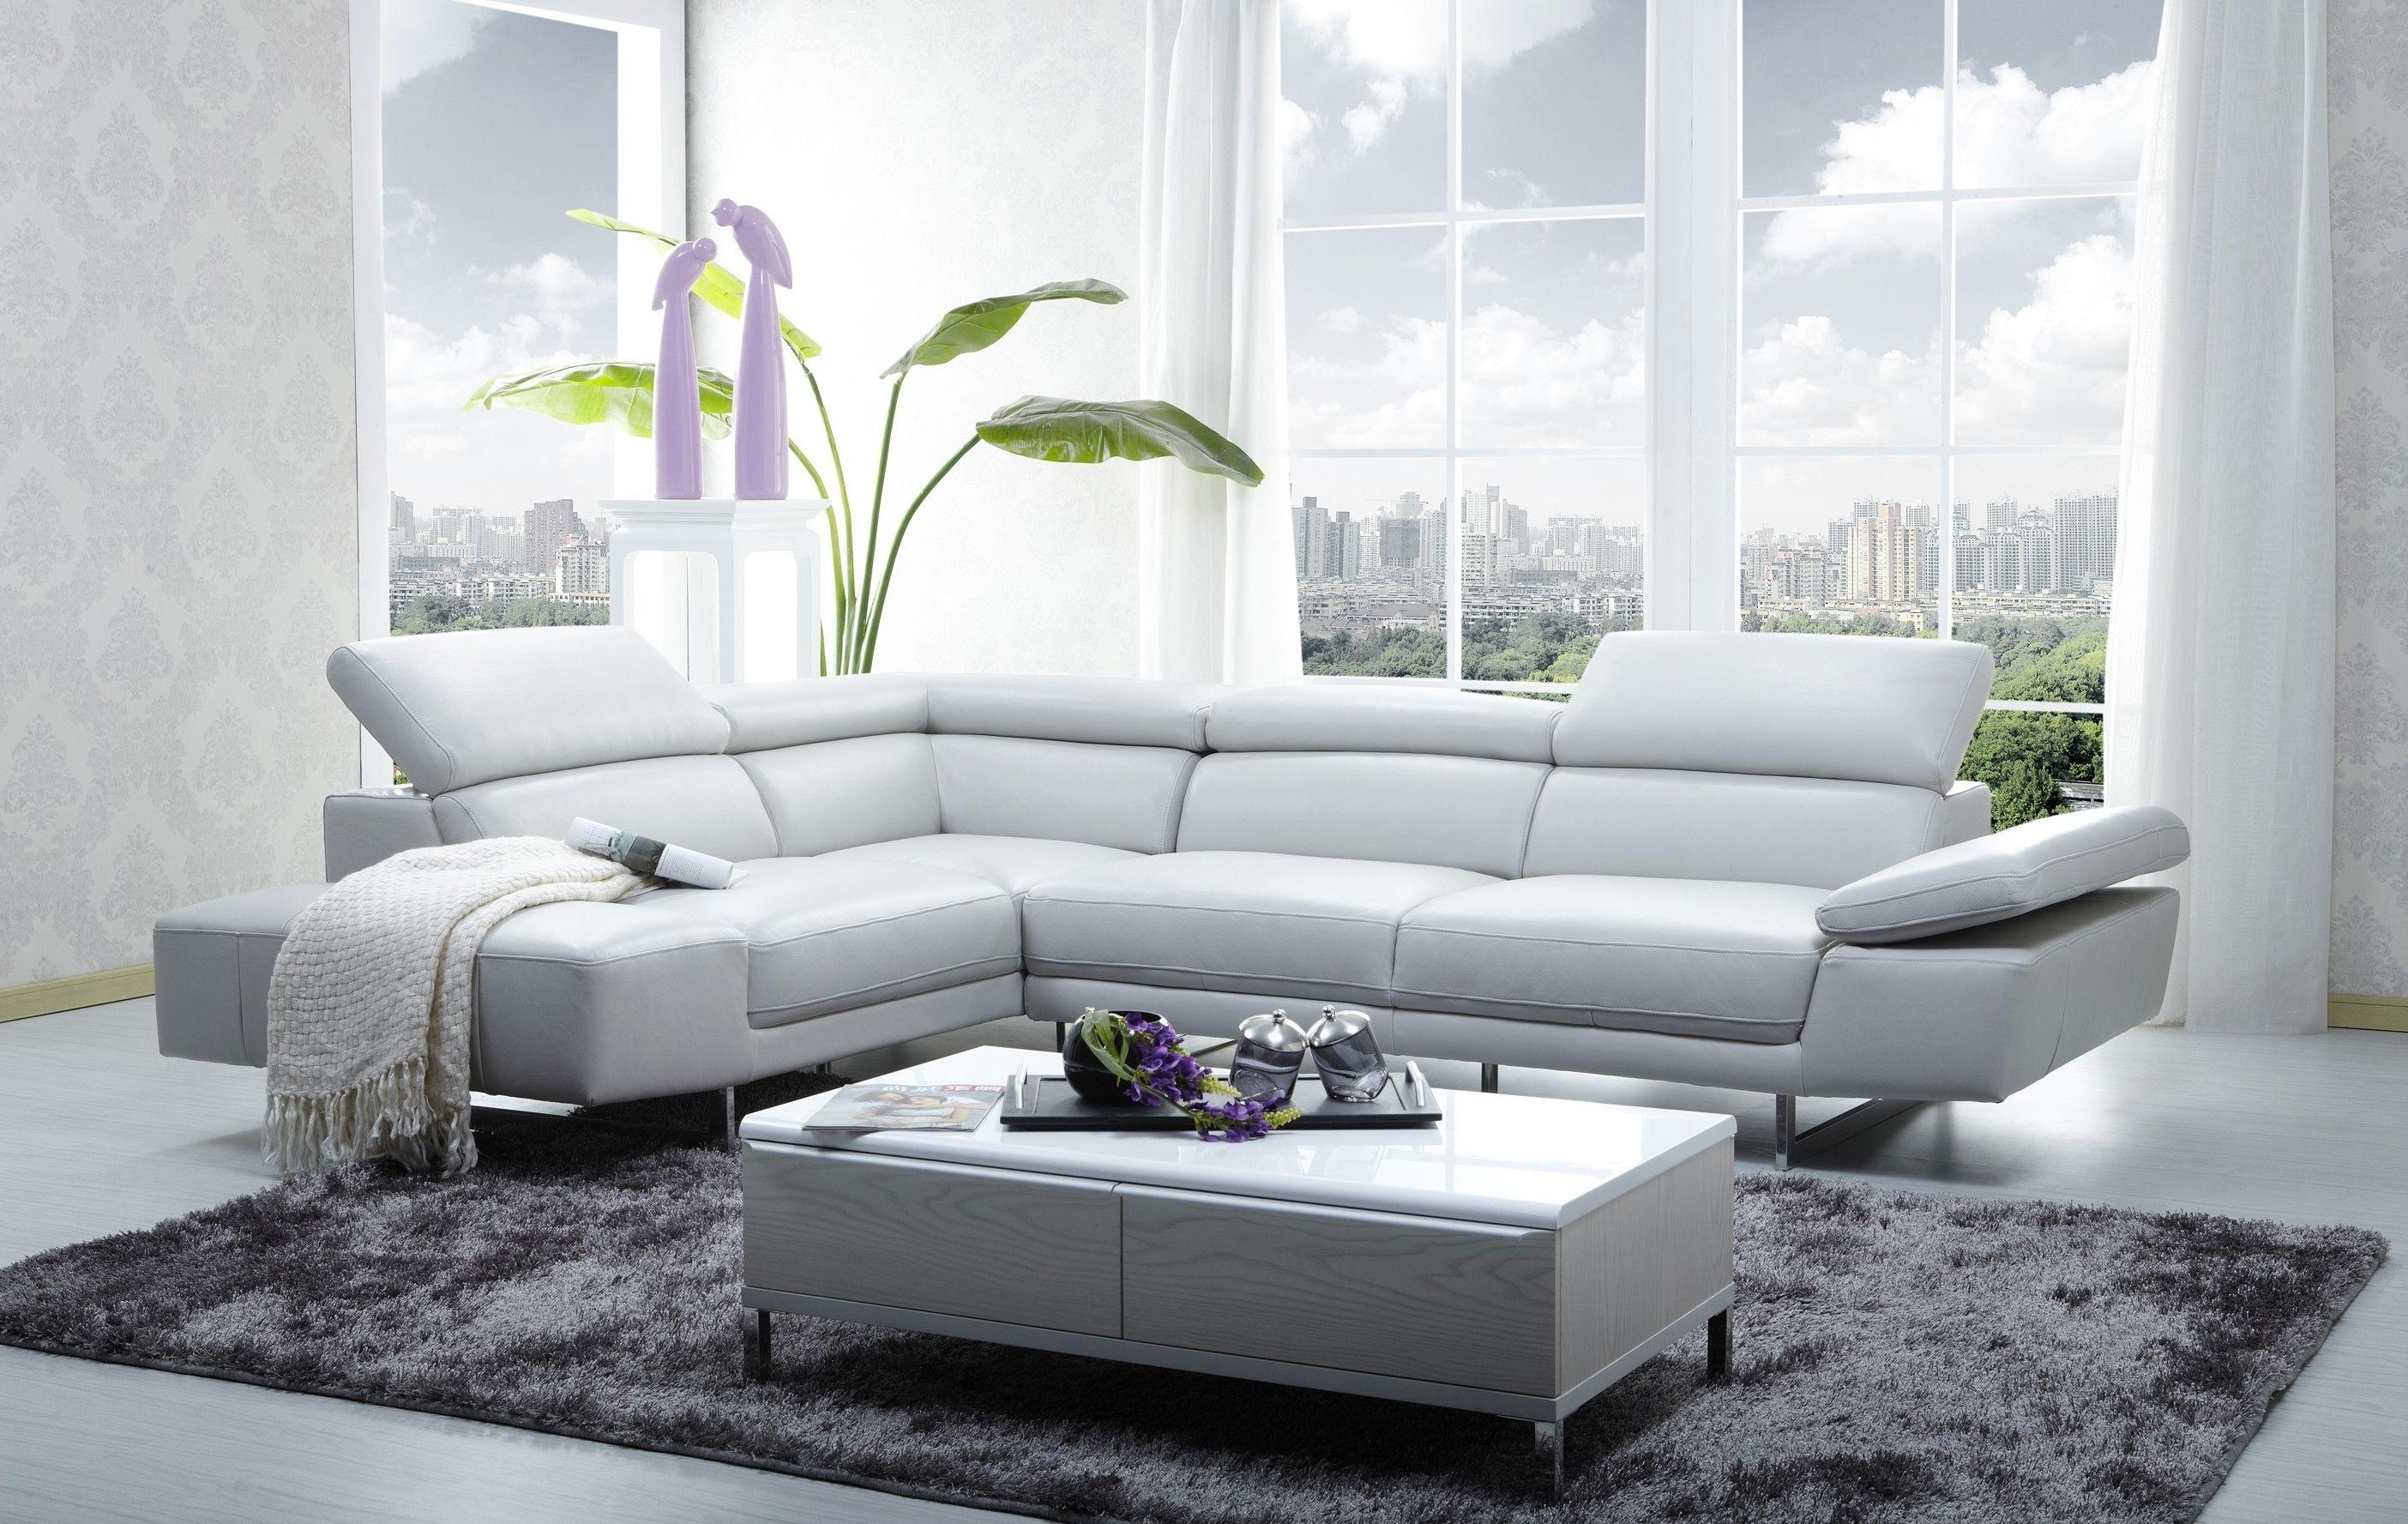 sectional sofas kijiji calgary extra large sofa beds uk 10 collection of at   ideas